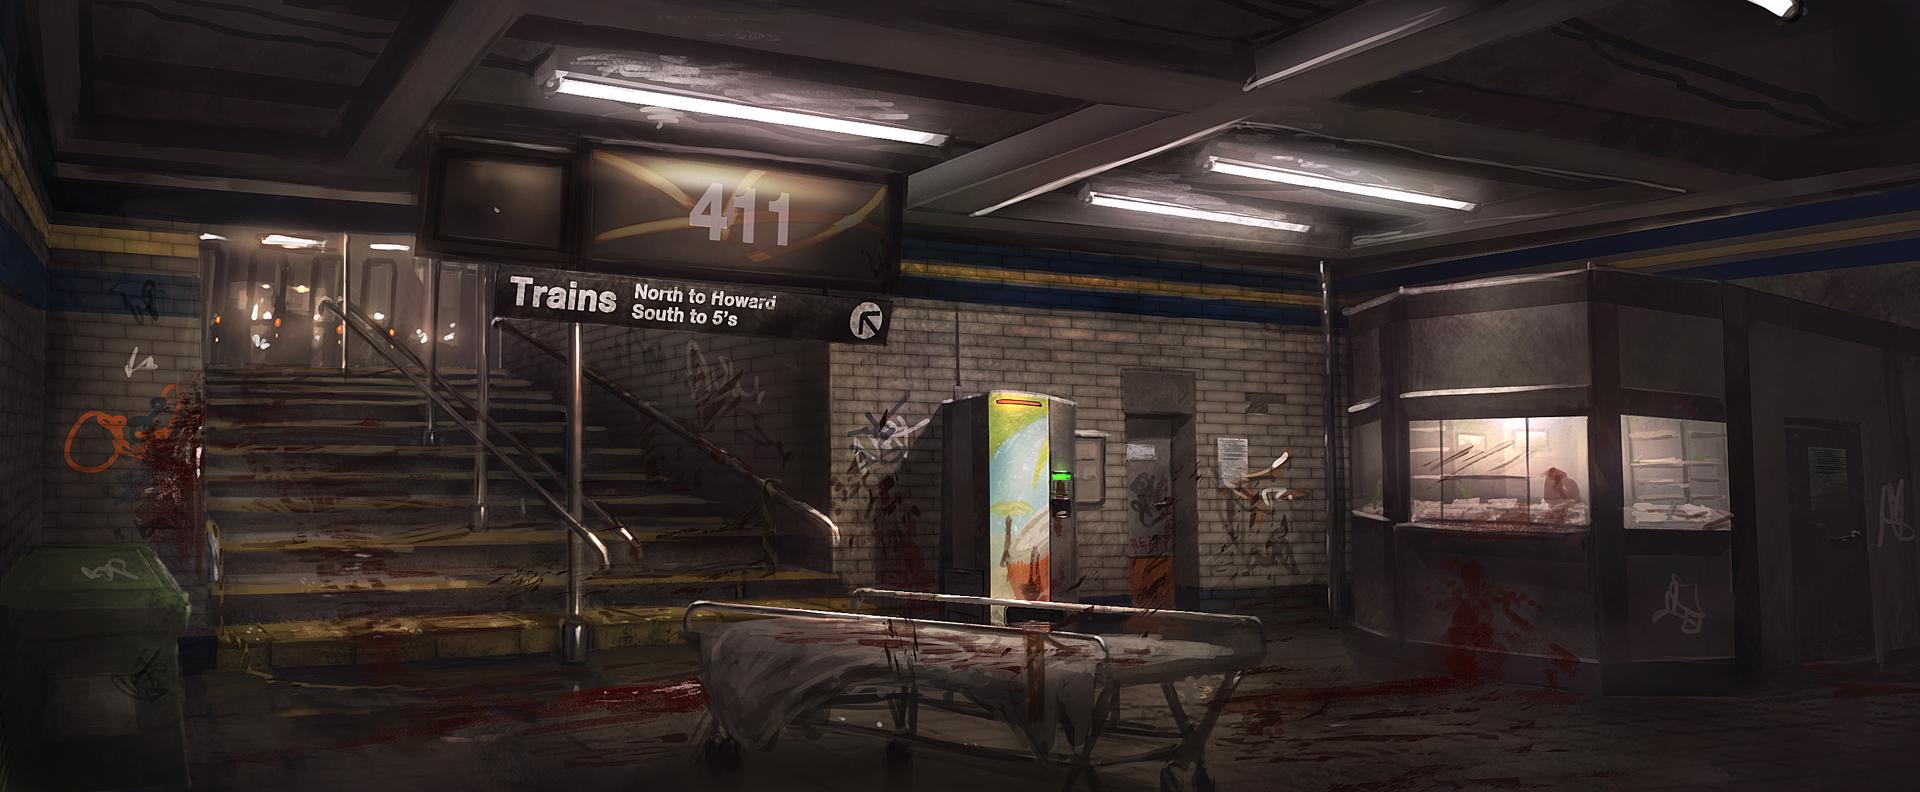 Subway concept art by Yellomice